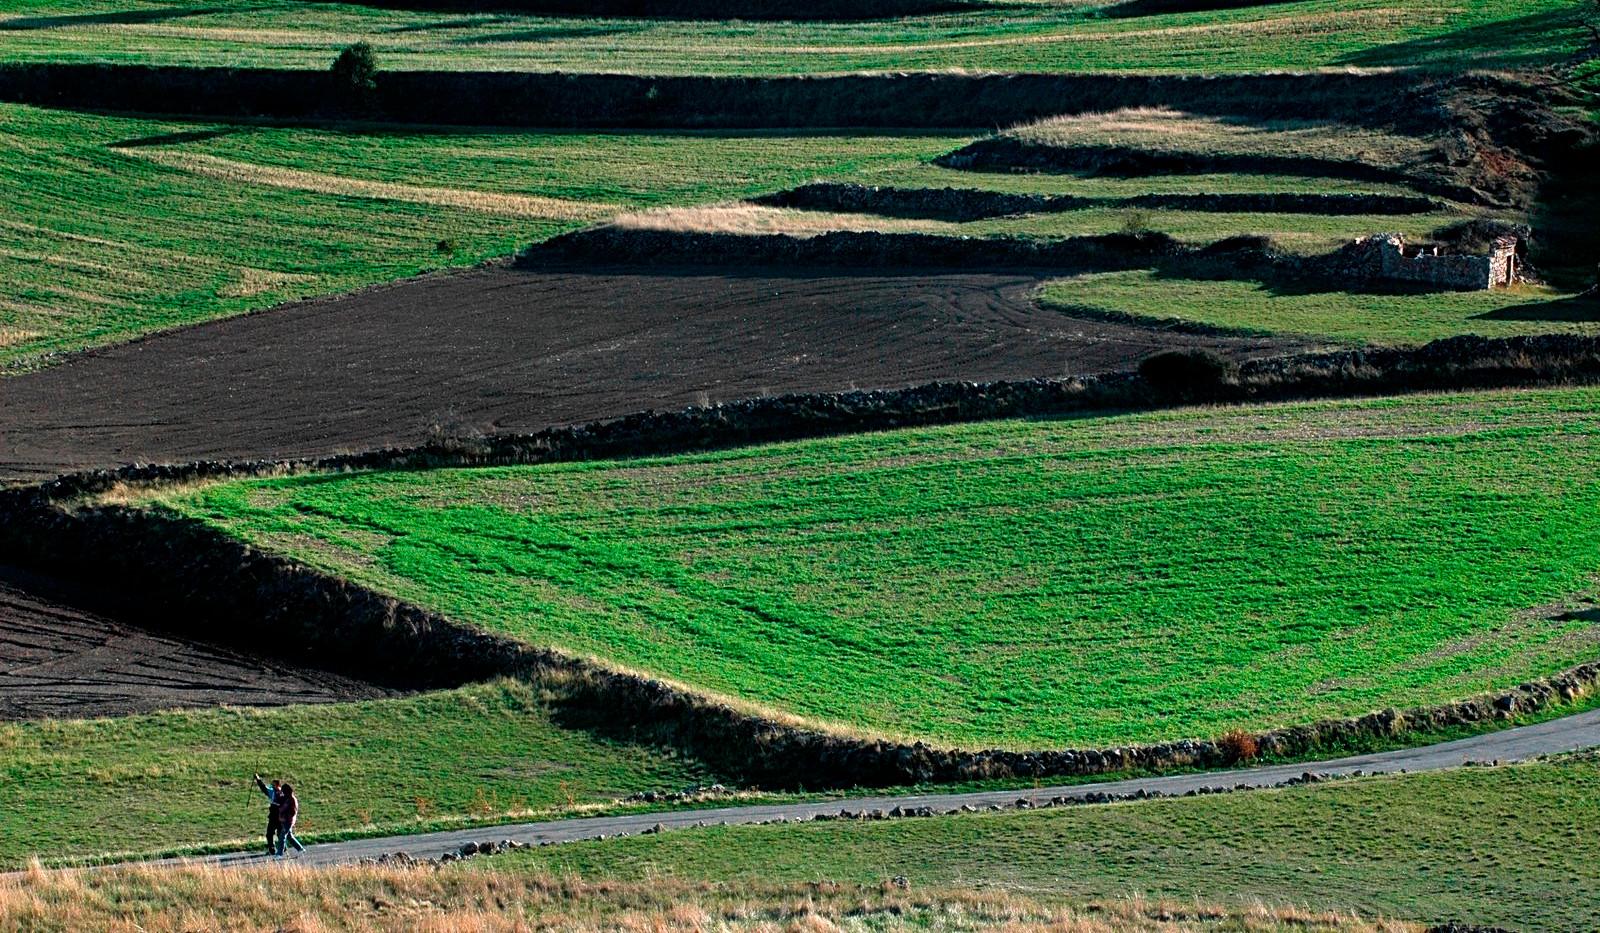 Campos verdes / Agricultural fields